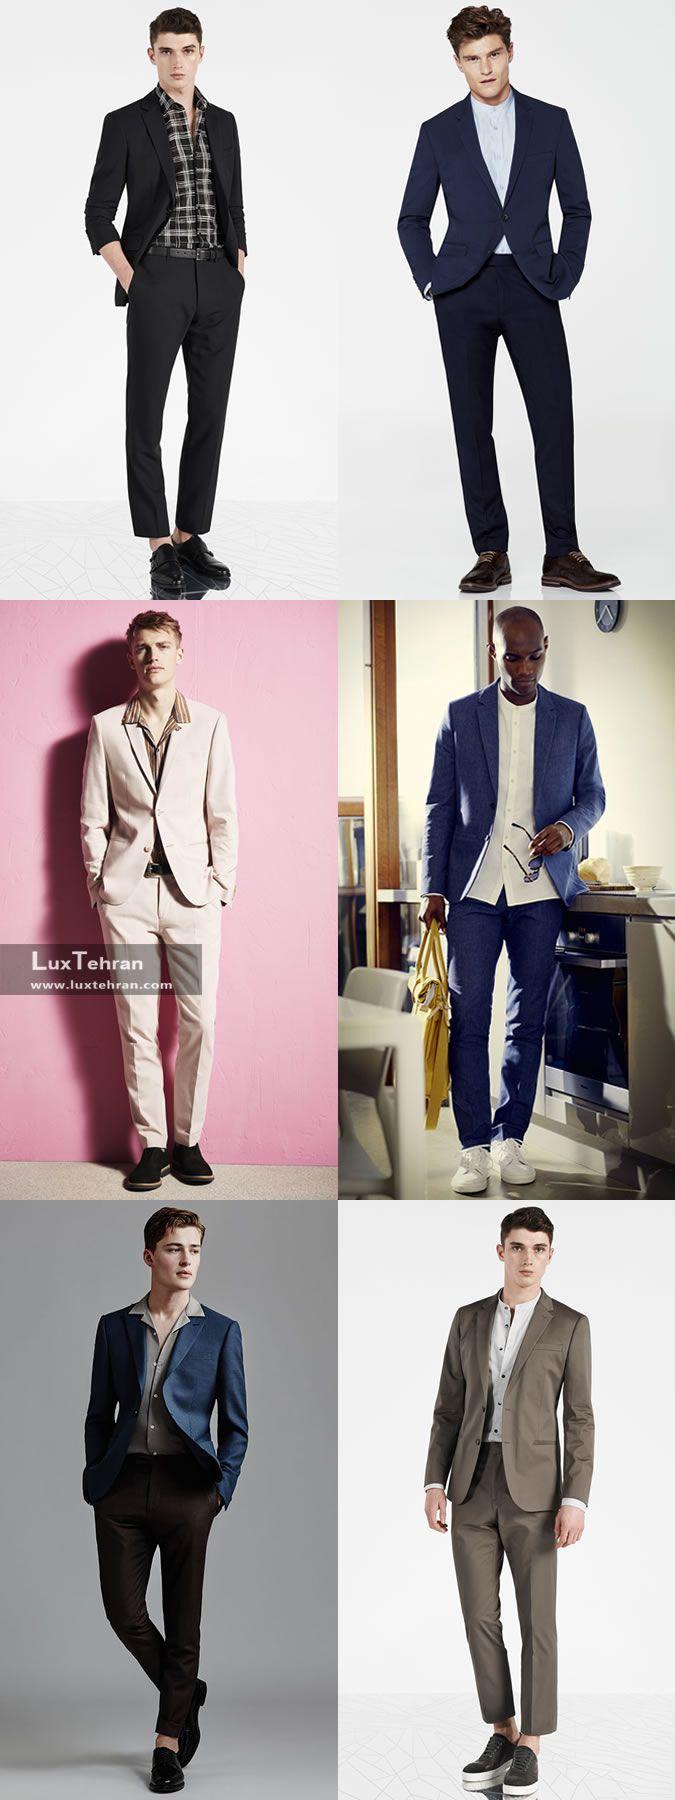 پیشنهاد ست لباس مردانه تابستانه